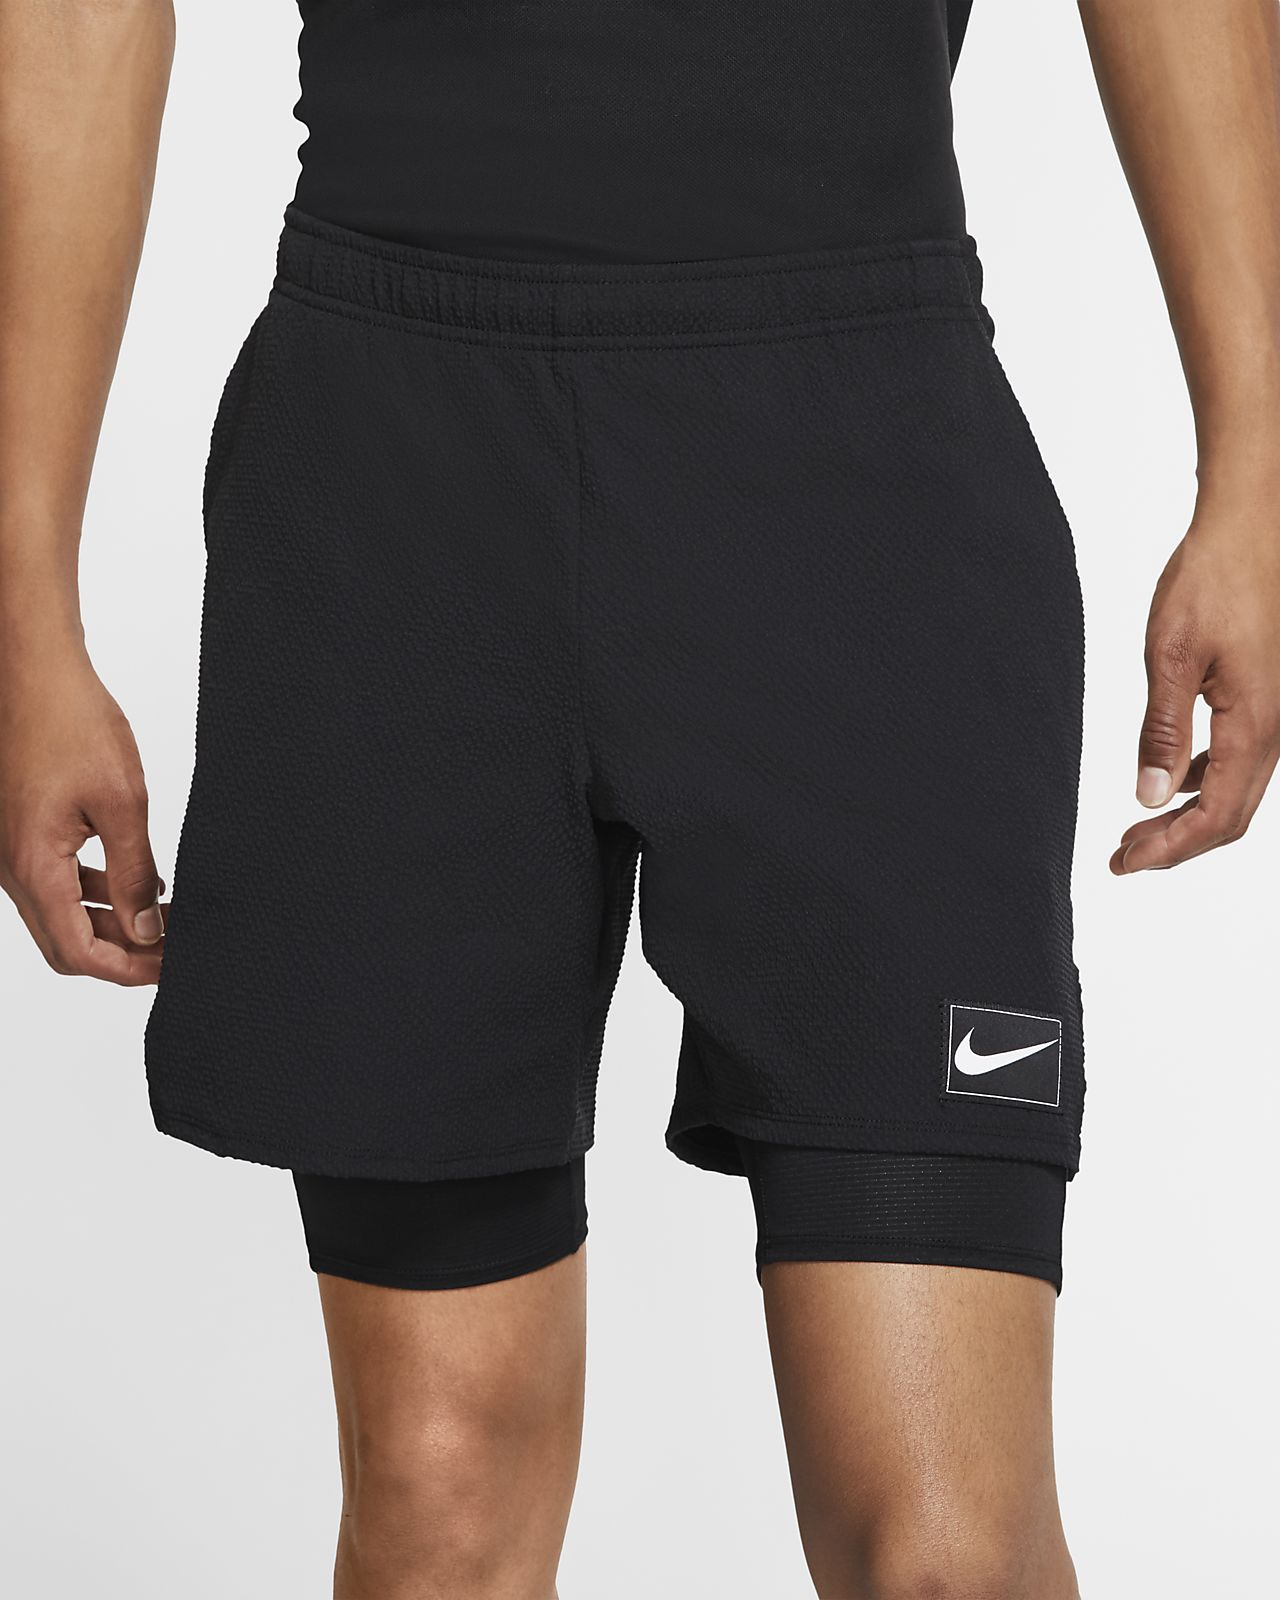 Shorts da tennis NikeCourt Ace - Uomo